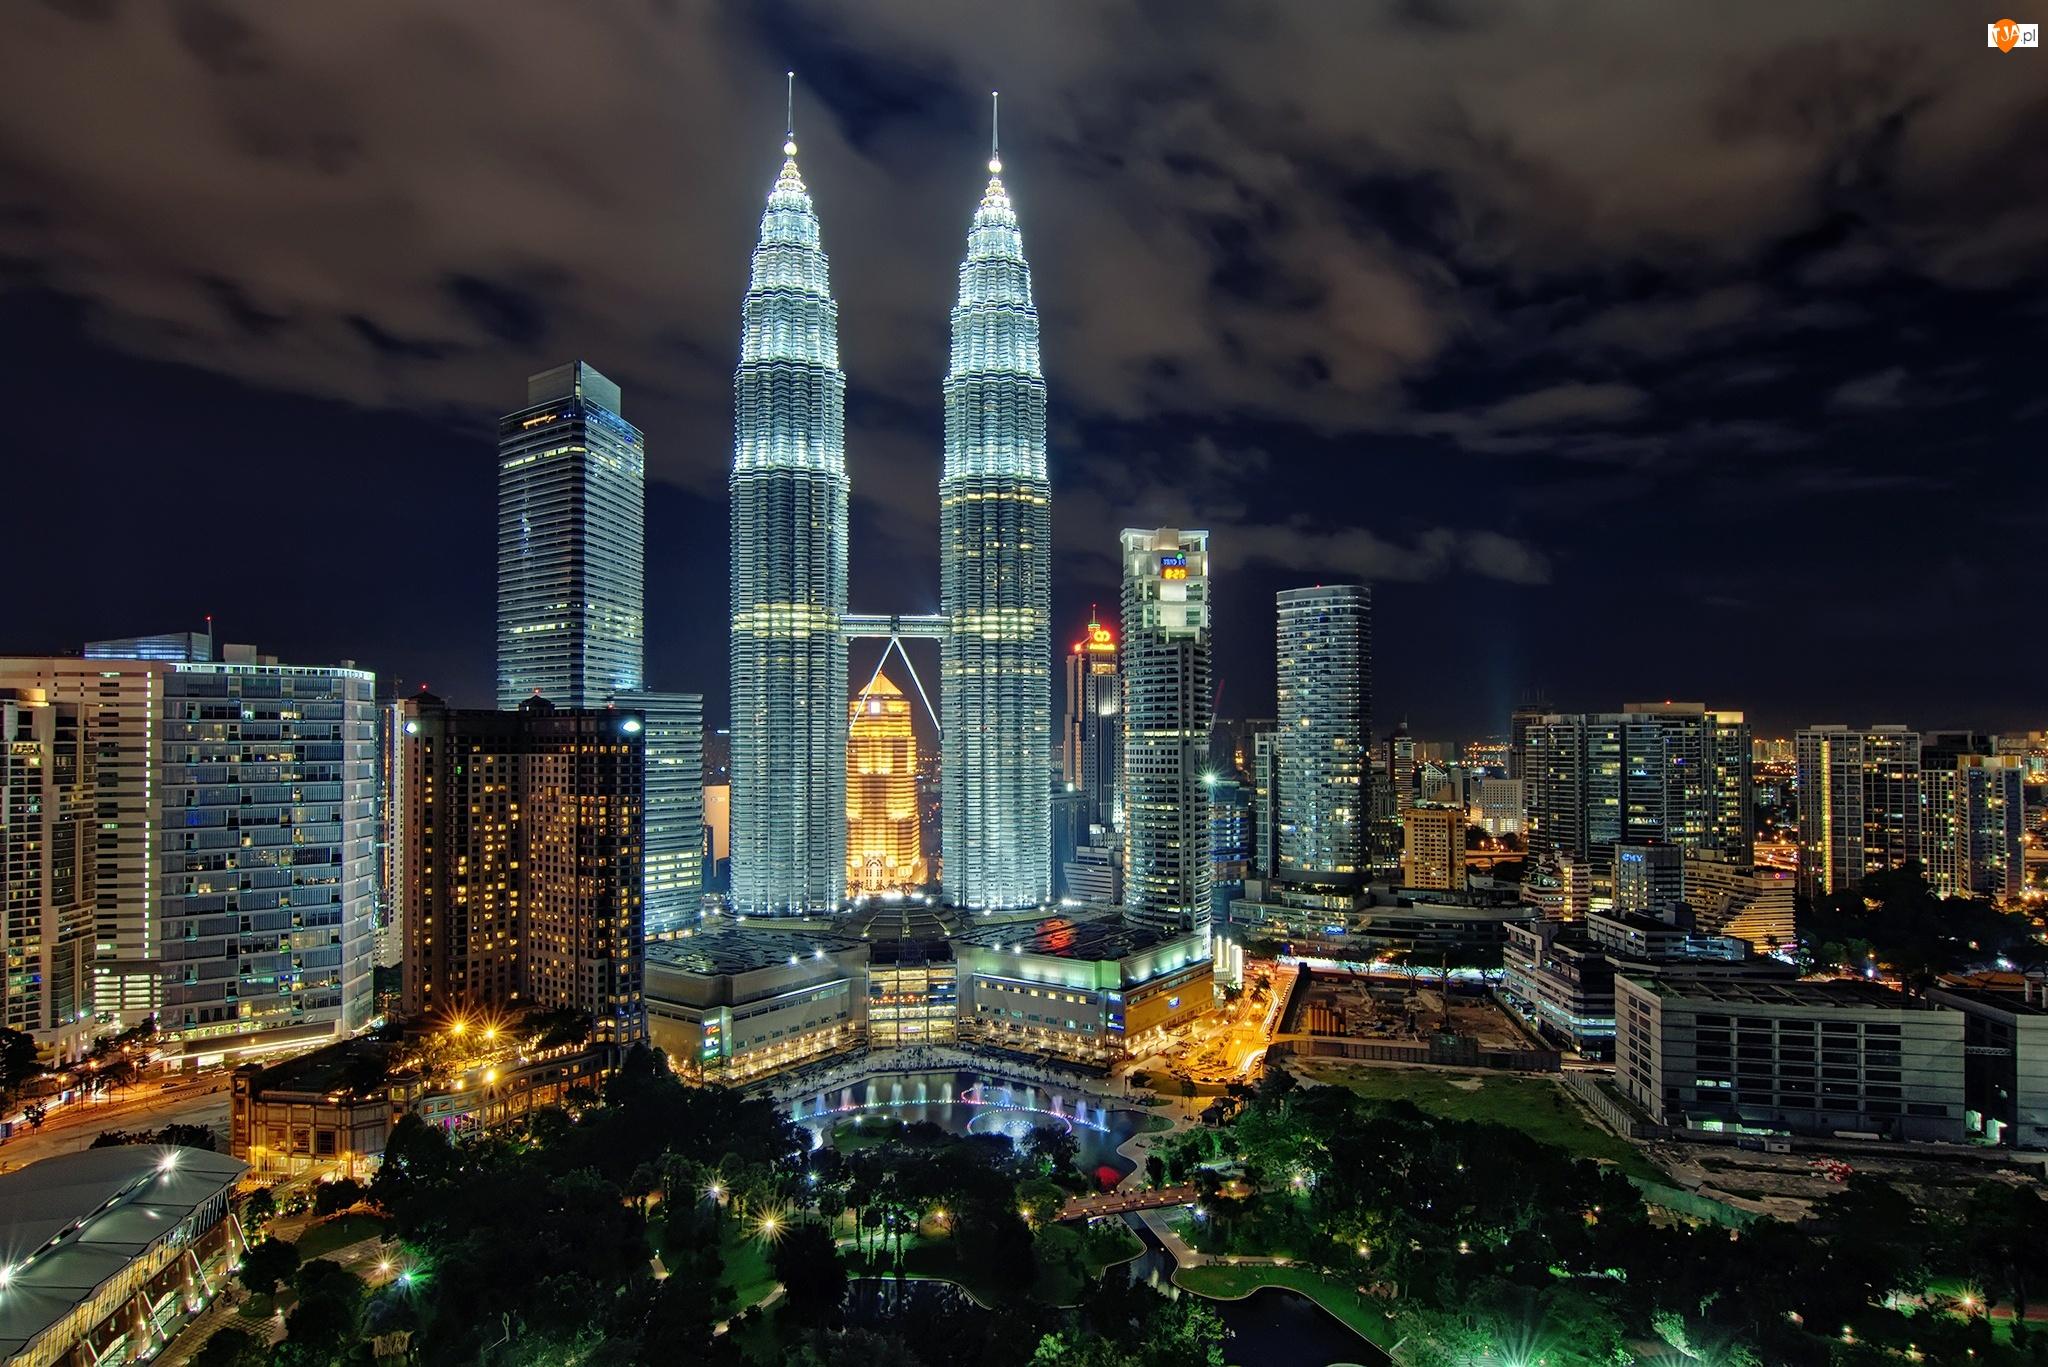 Malezja, Noc, Kuala Lumpur, Miasto